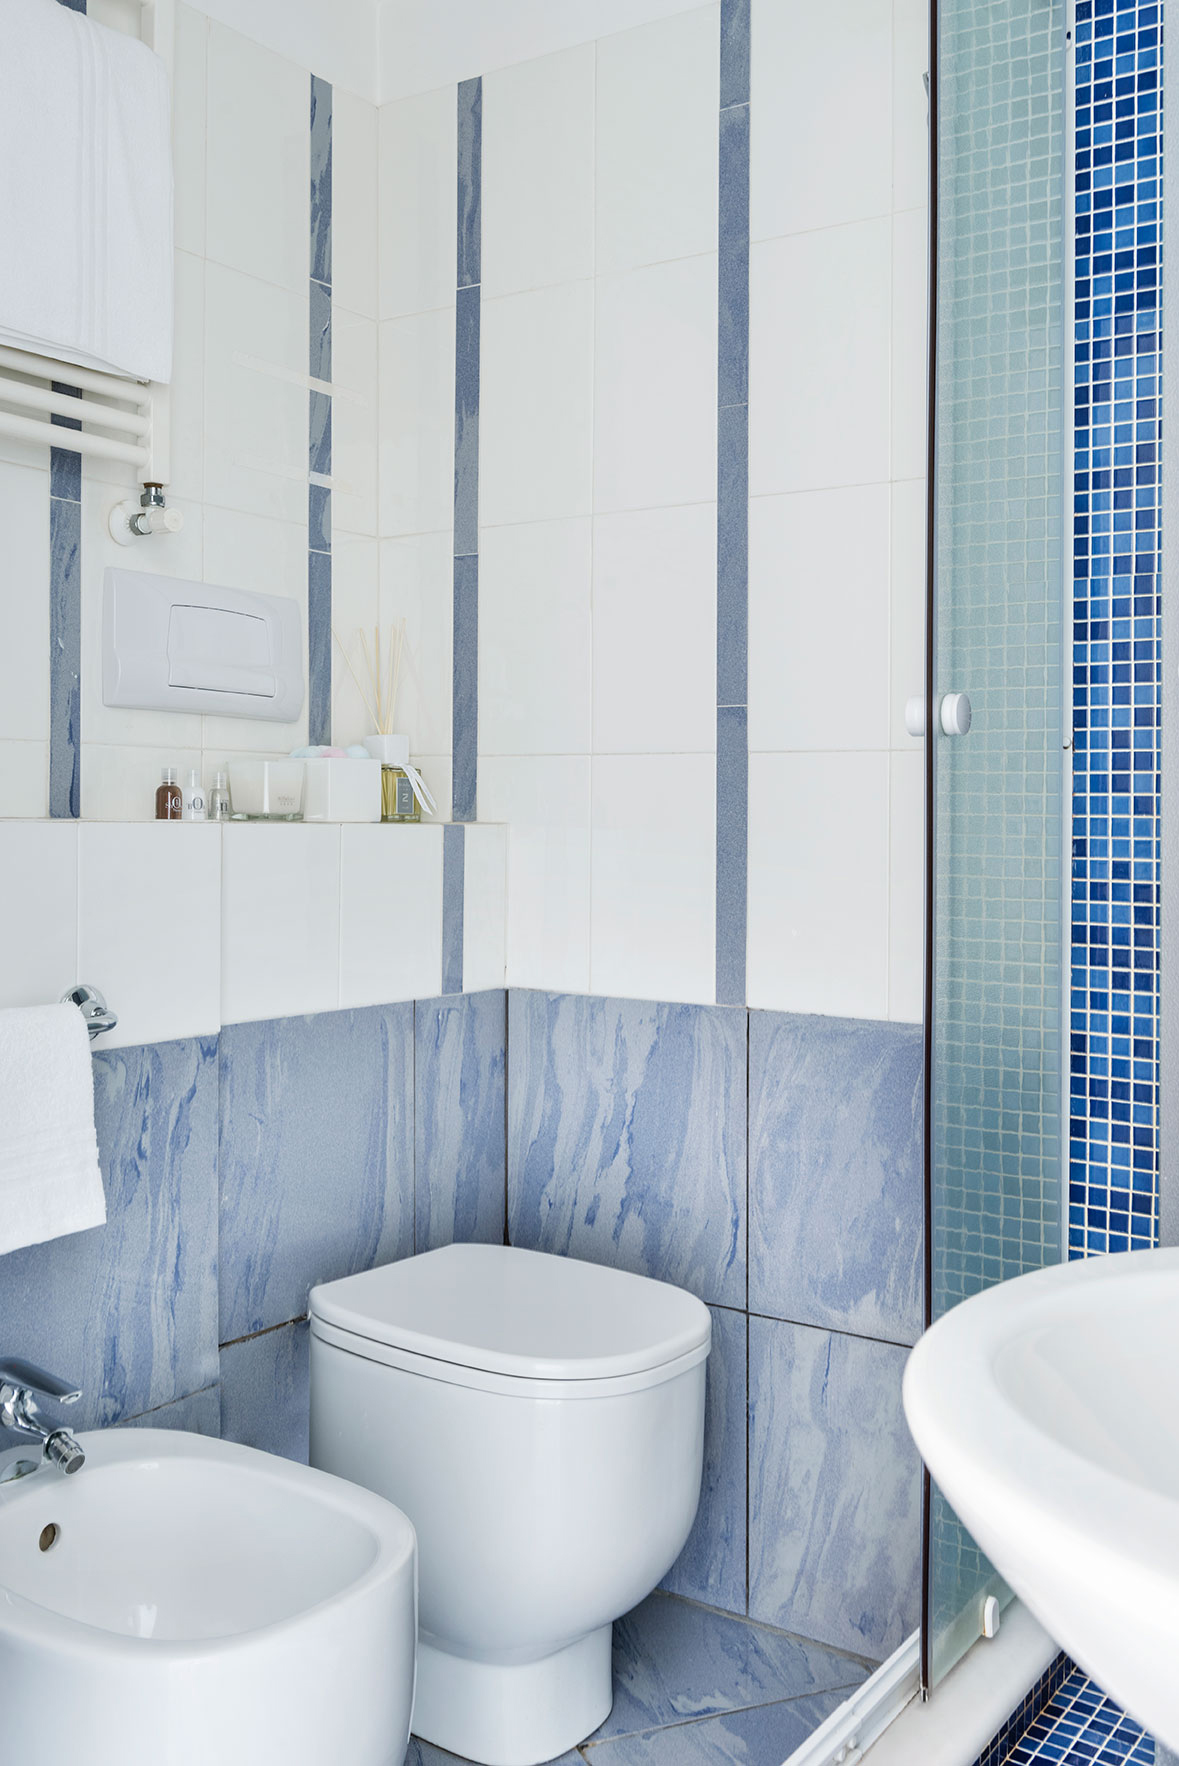 camere-standard-fiorentini-residence-napoli-9